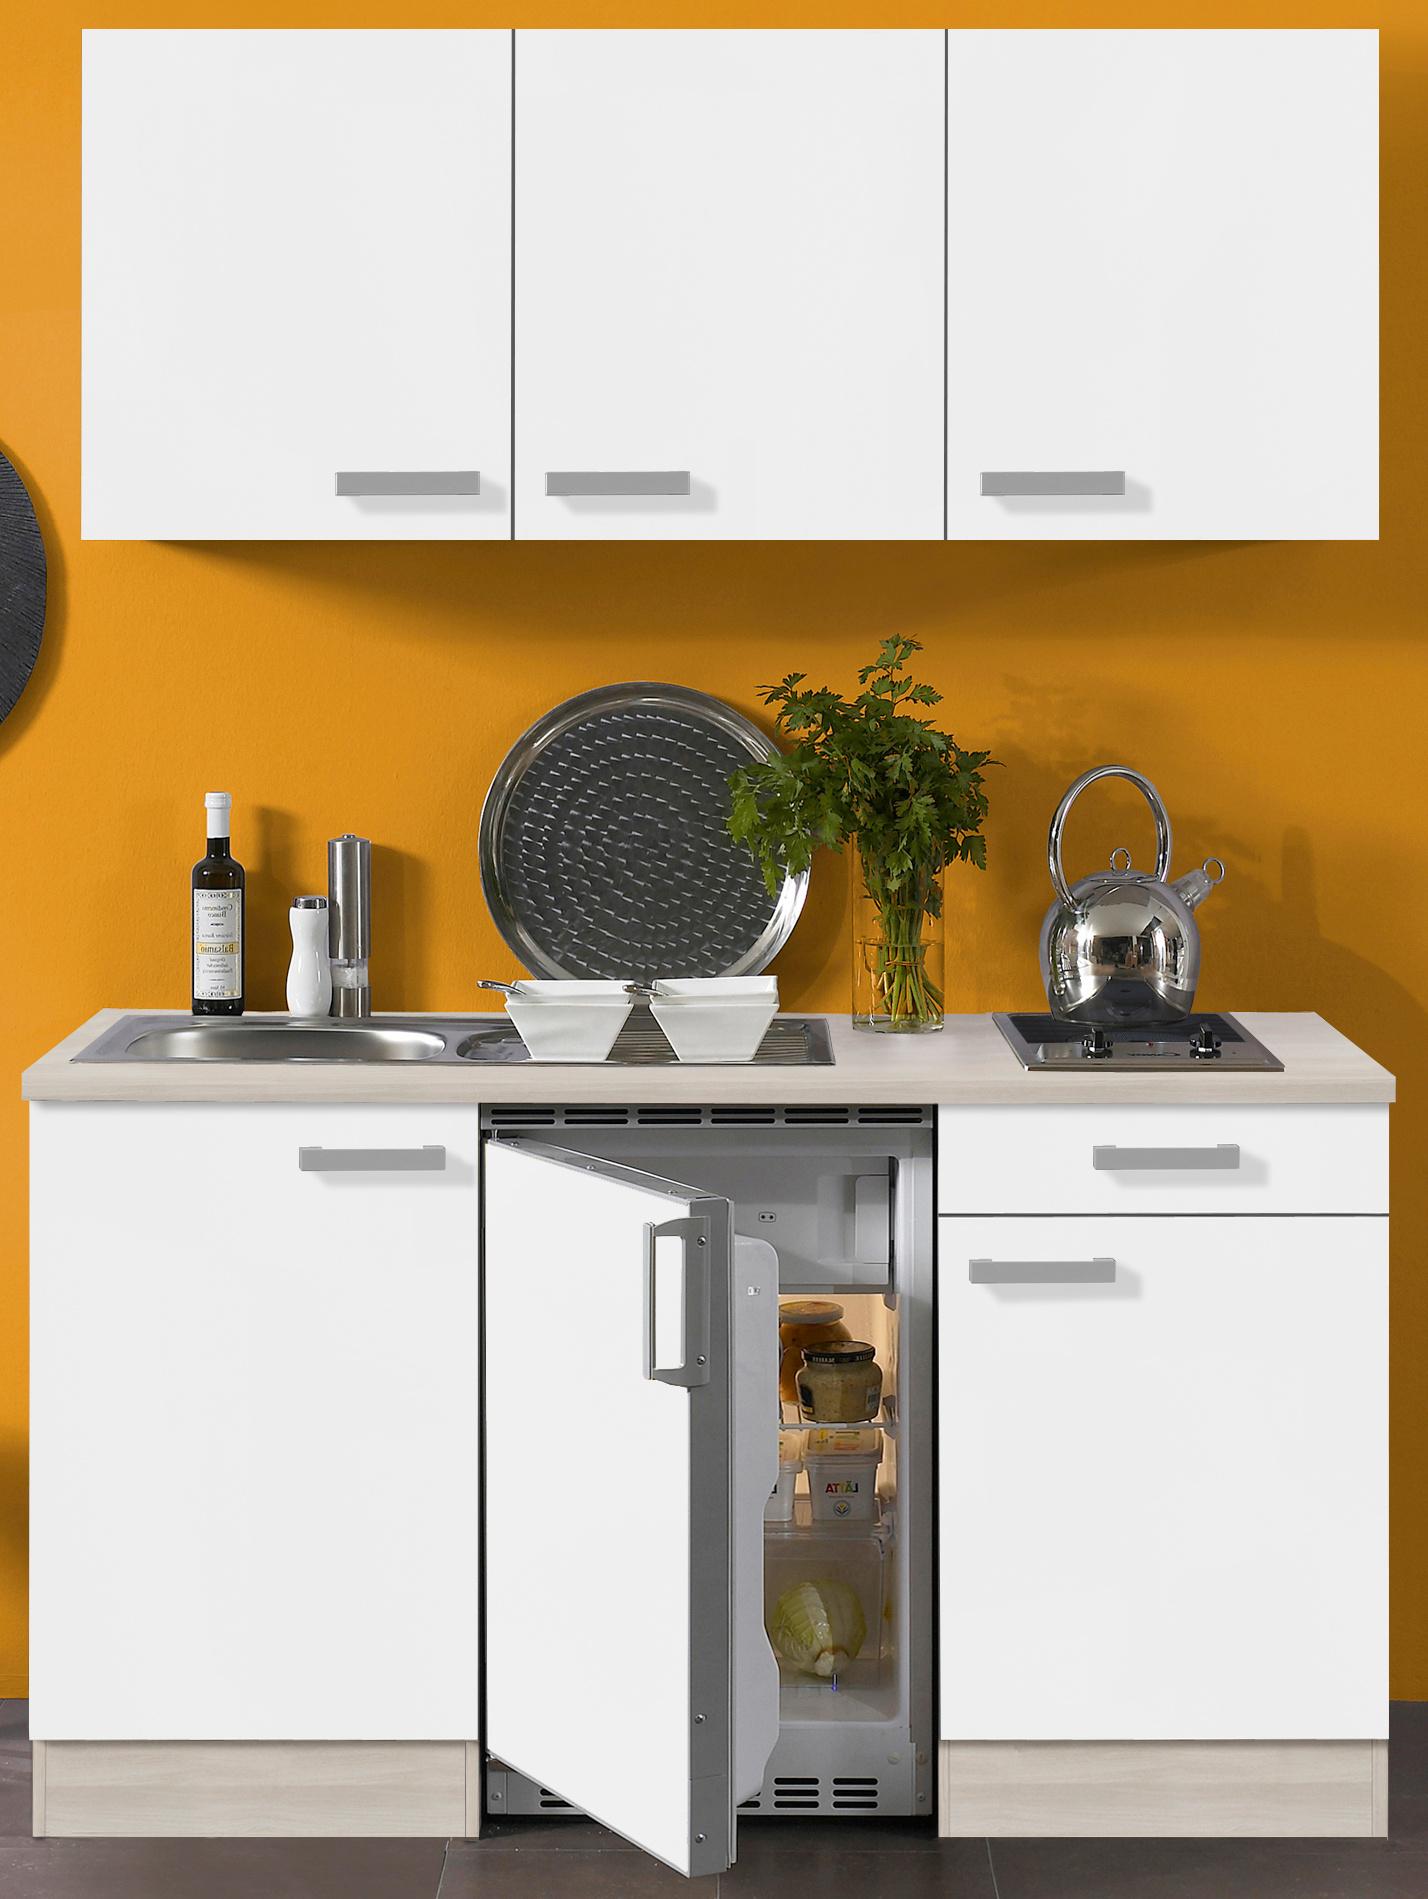 singlek che barcelona glaskeramik kochfeld 8 teilig breite 150 cm wei k che singlek chen. Black Bedroom Furniture Sets. Home Design Ideas